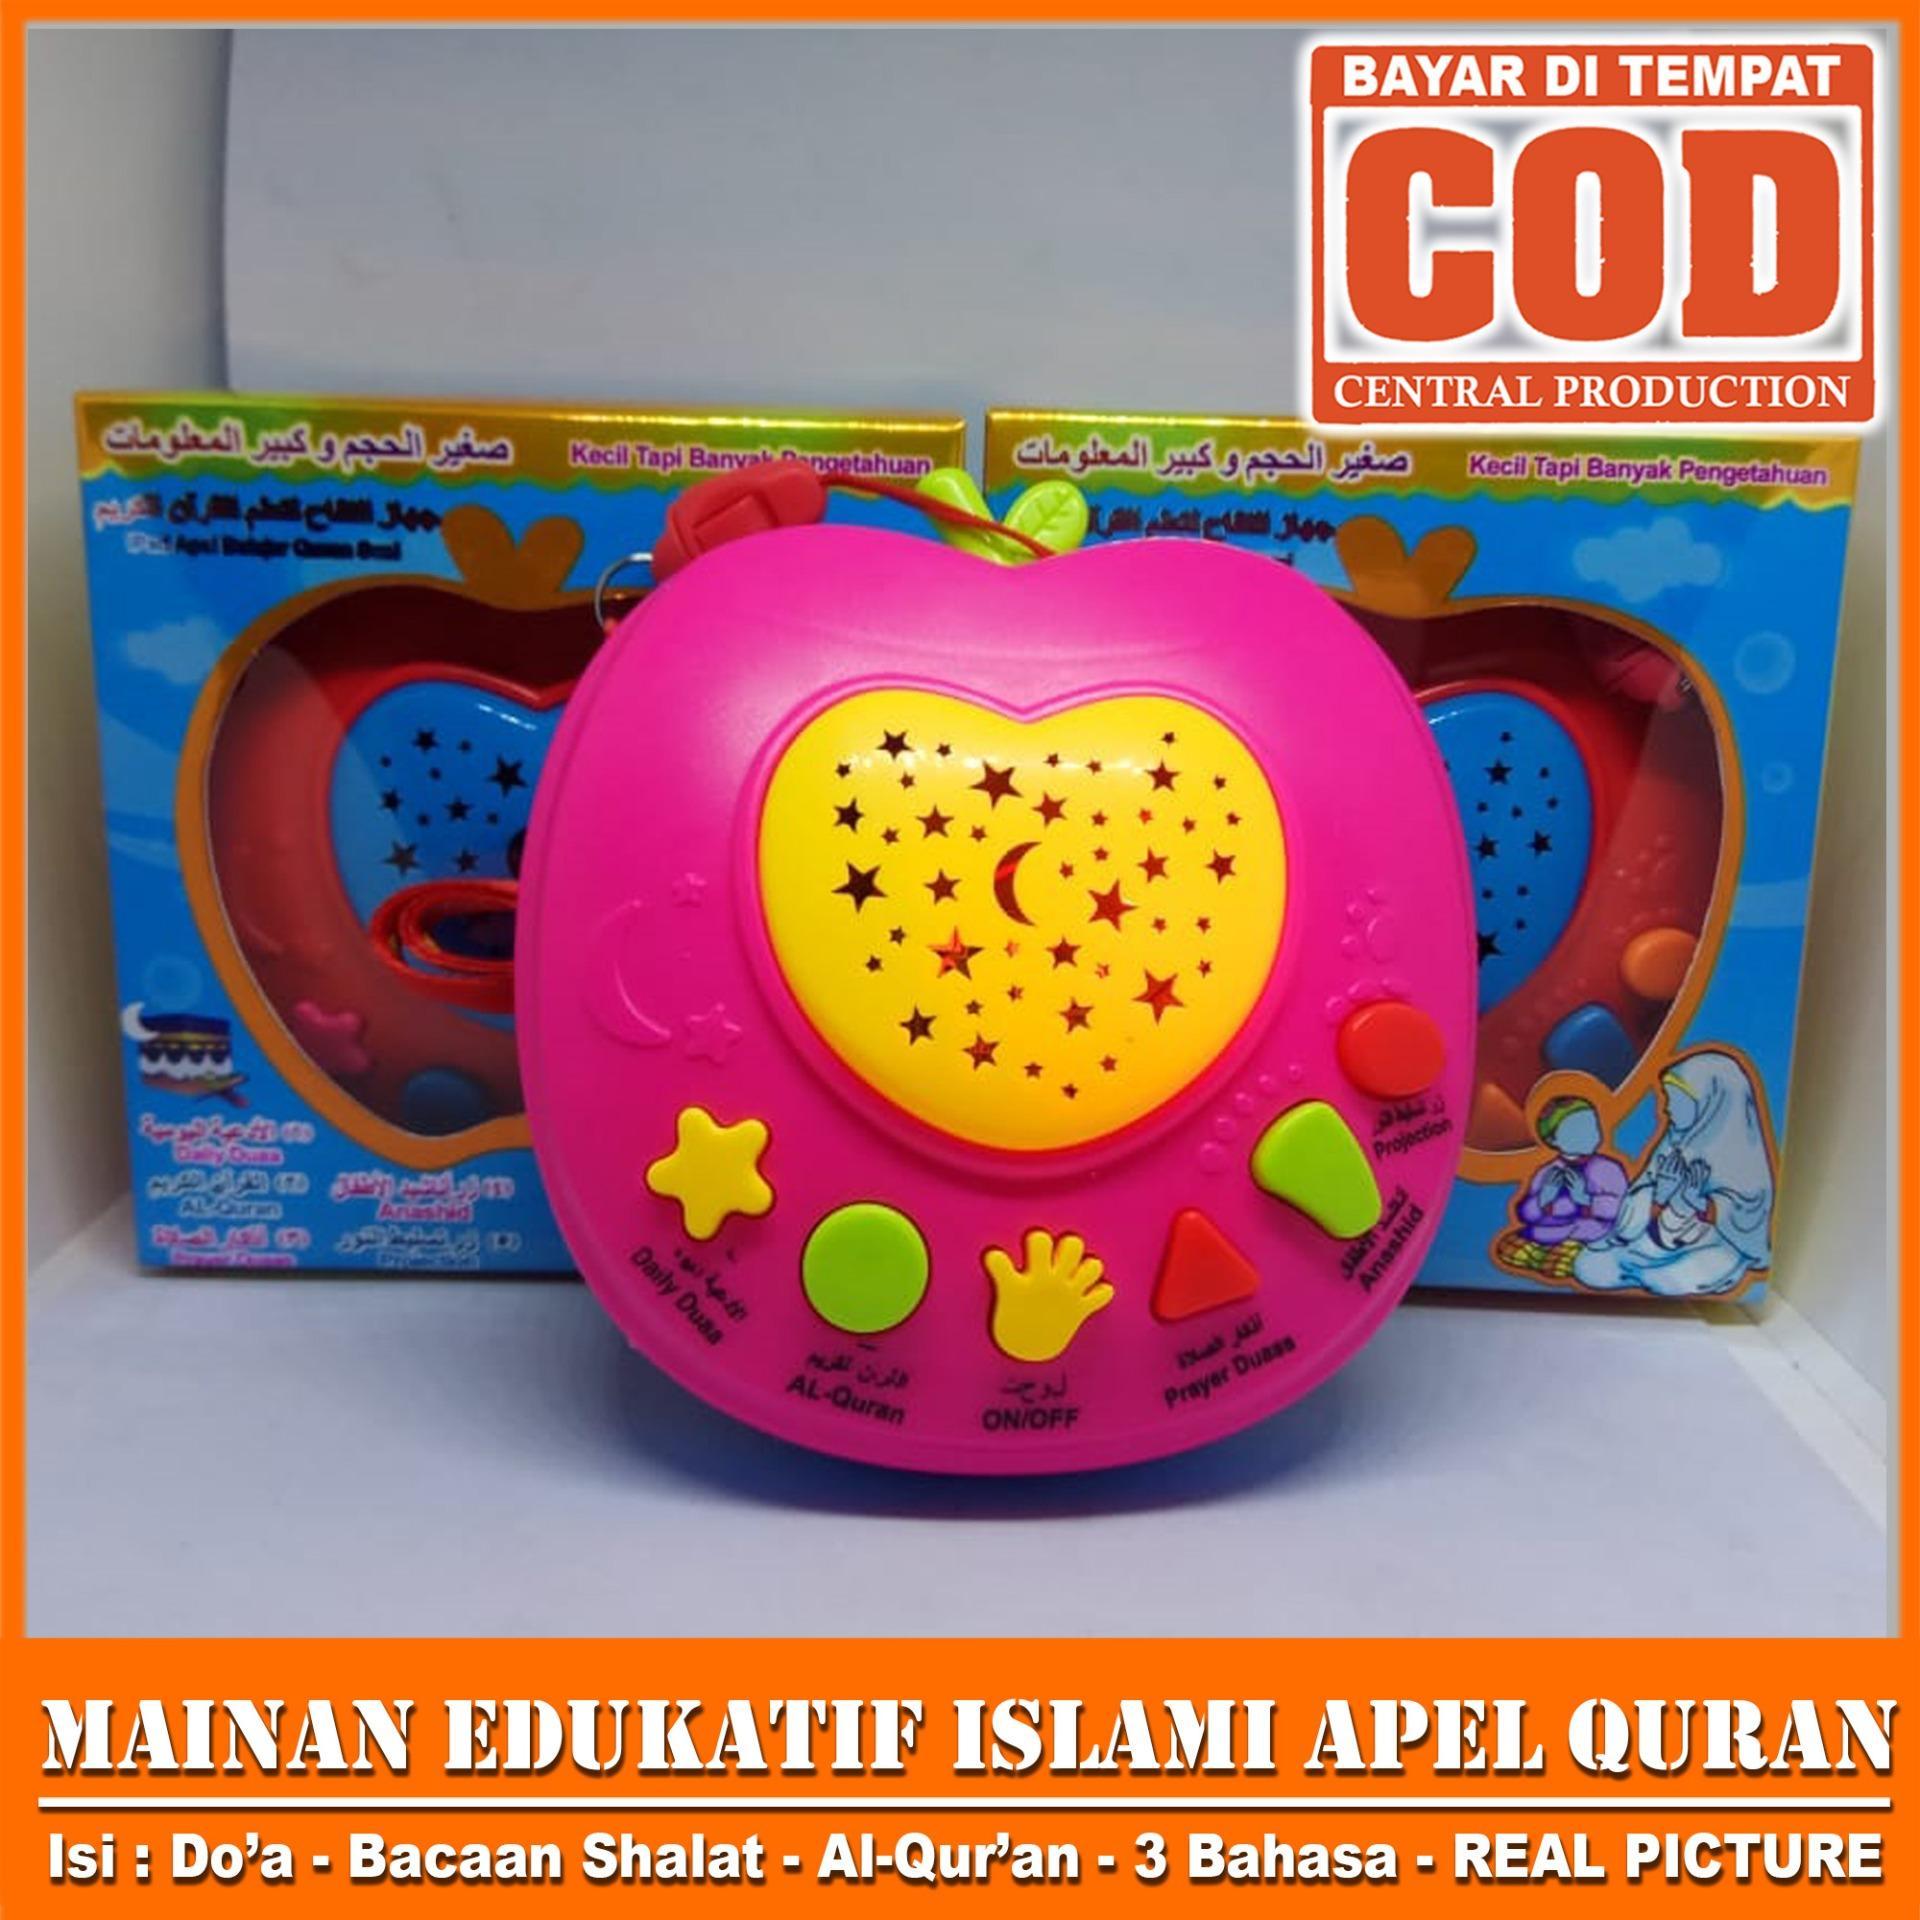 Mainan Anak Ipad Apel Mesin Quran / Al-Qur'an Anak Digital / Hafiz Model Apel FREE 3 pcs Baterai REAL PICTURE